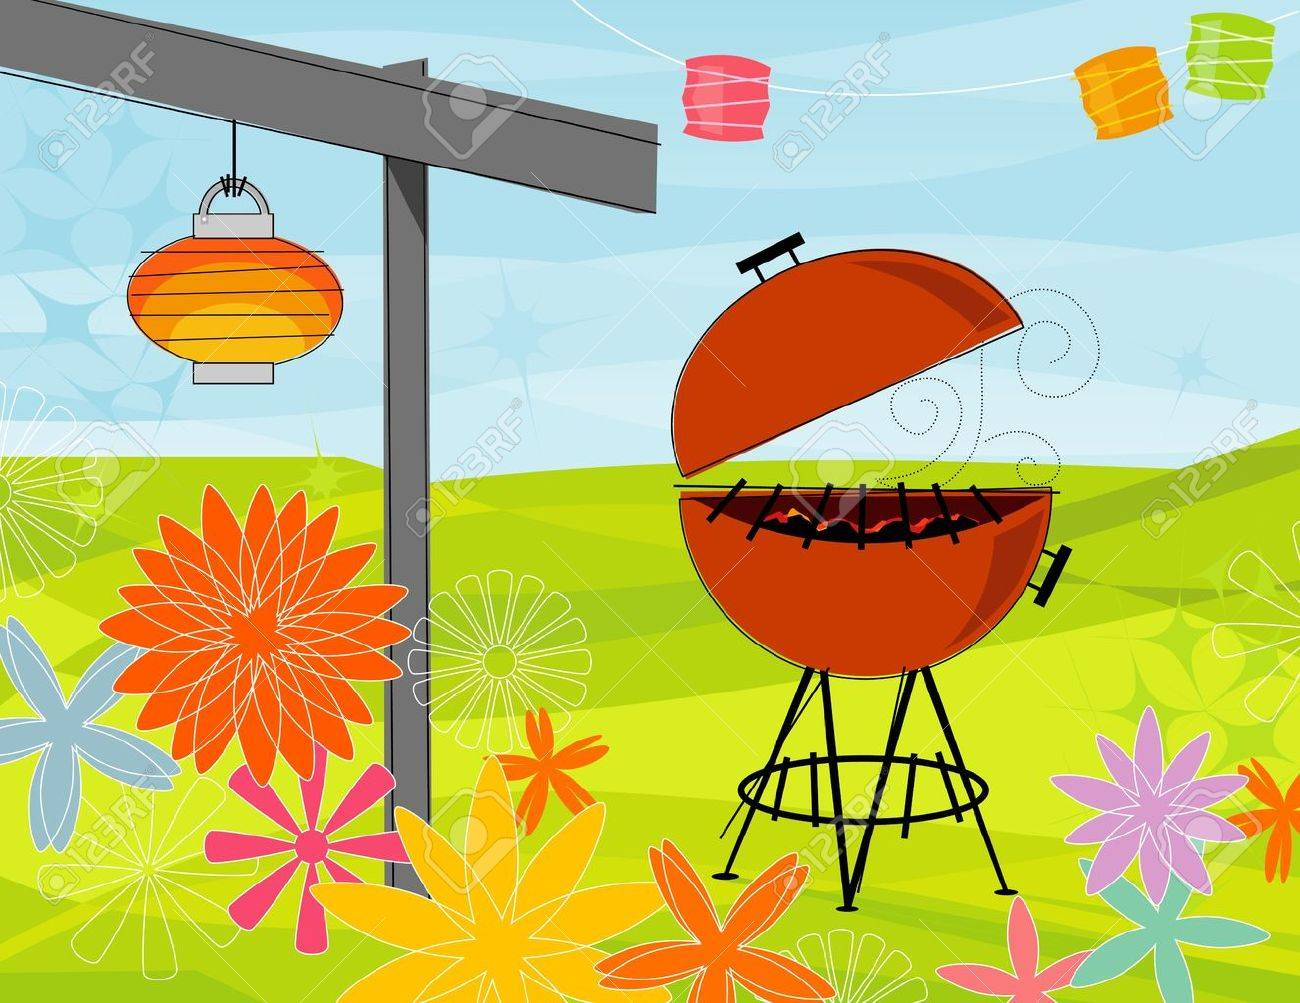 Backyard Bbq Cliparts Stock Vector And Royalty Free - Backyard bbq party cartoon